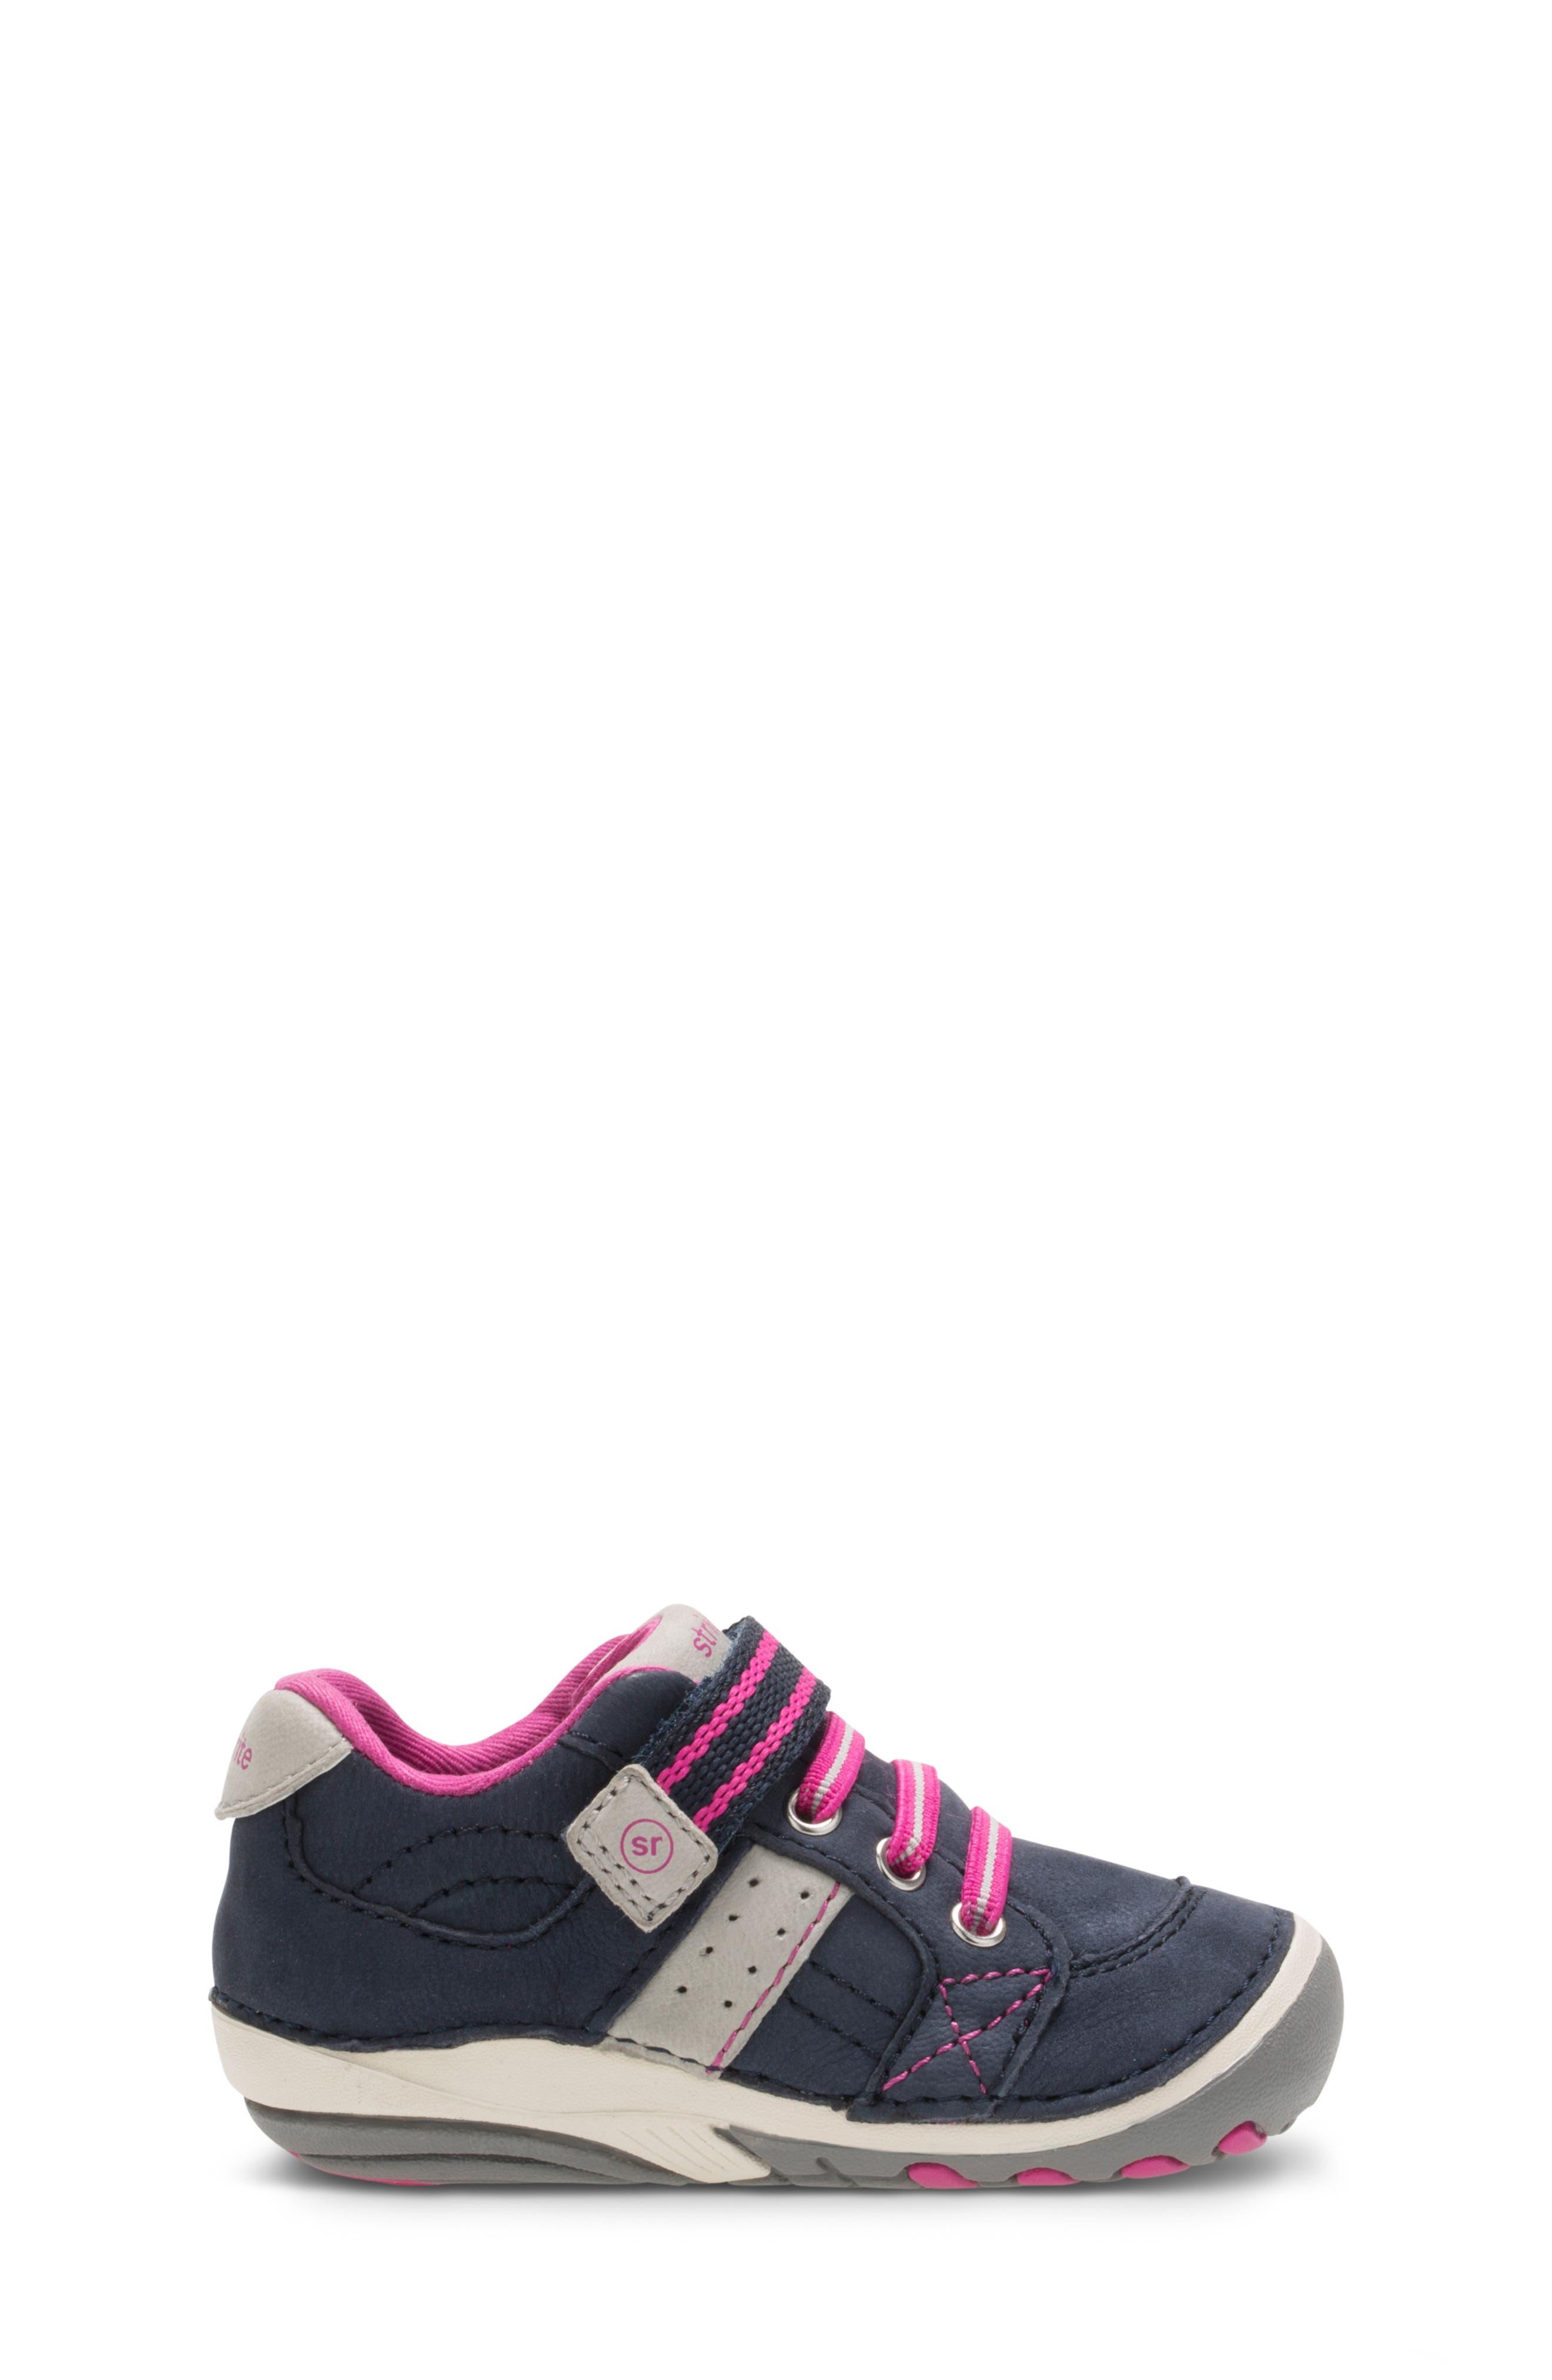 'Artie' Sneaker,                             Alternate thumbnail 3, color,                             NAVY/ PINK